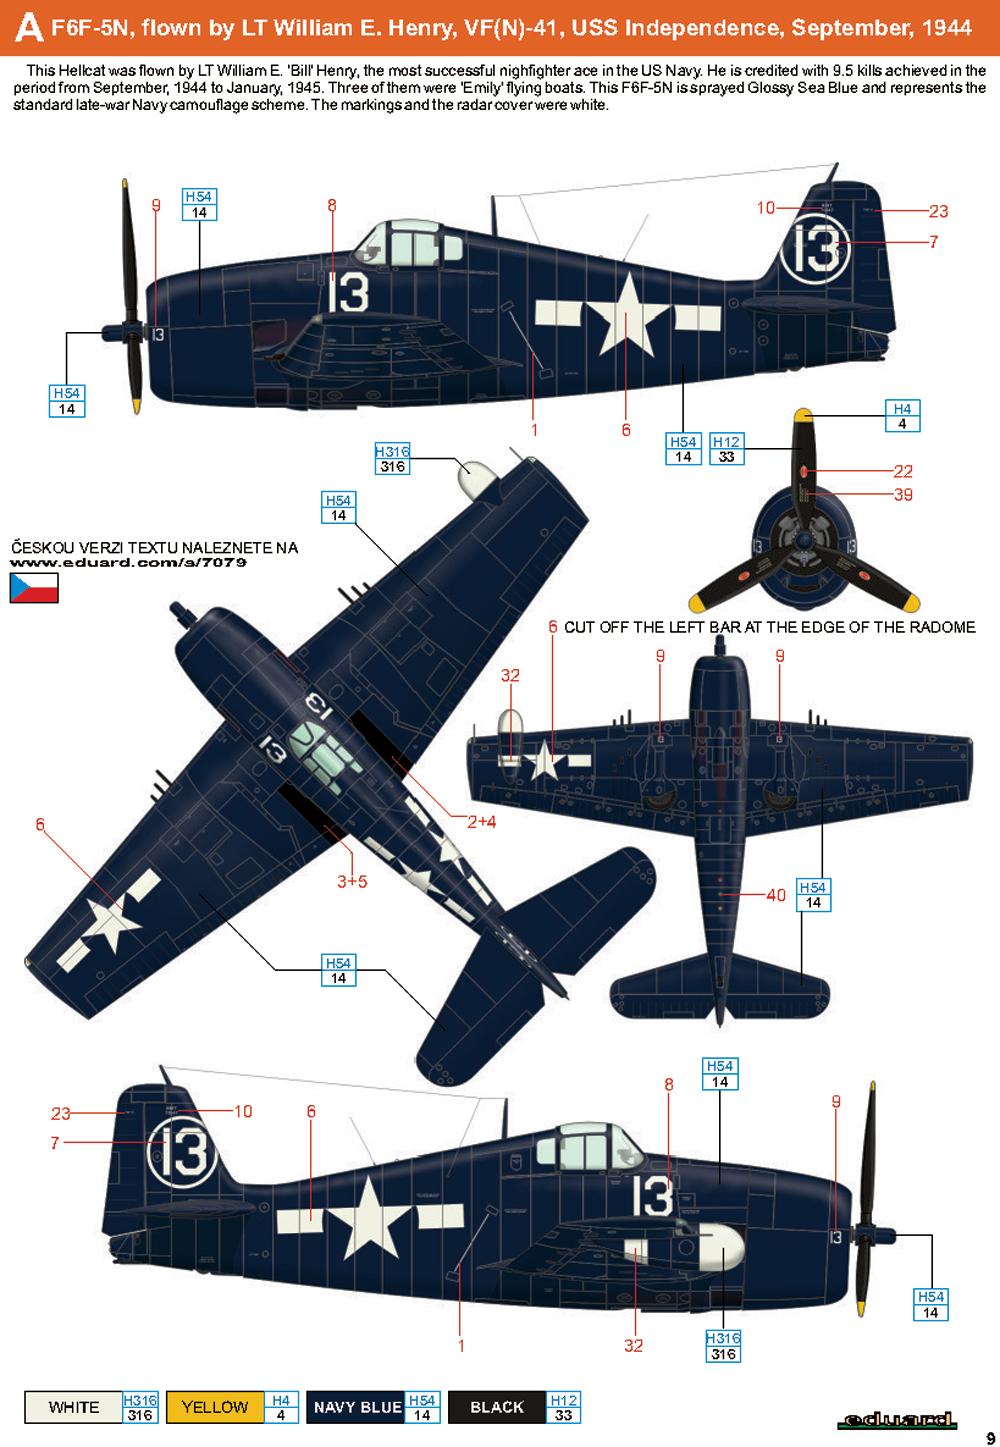 Grumman F6F 5N Hellcat VFN 41 White 13 LT William E. Henry USS Independence Sep 1944 0C